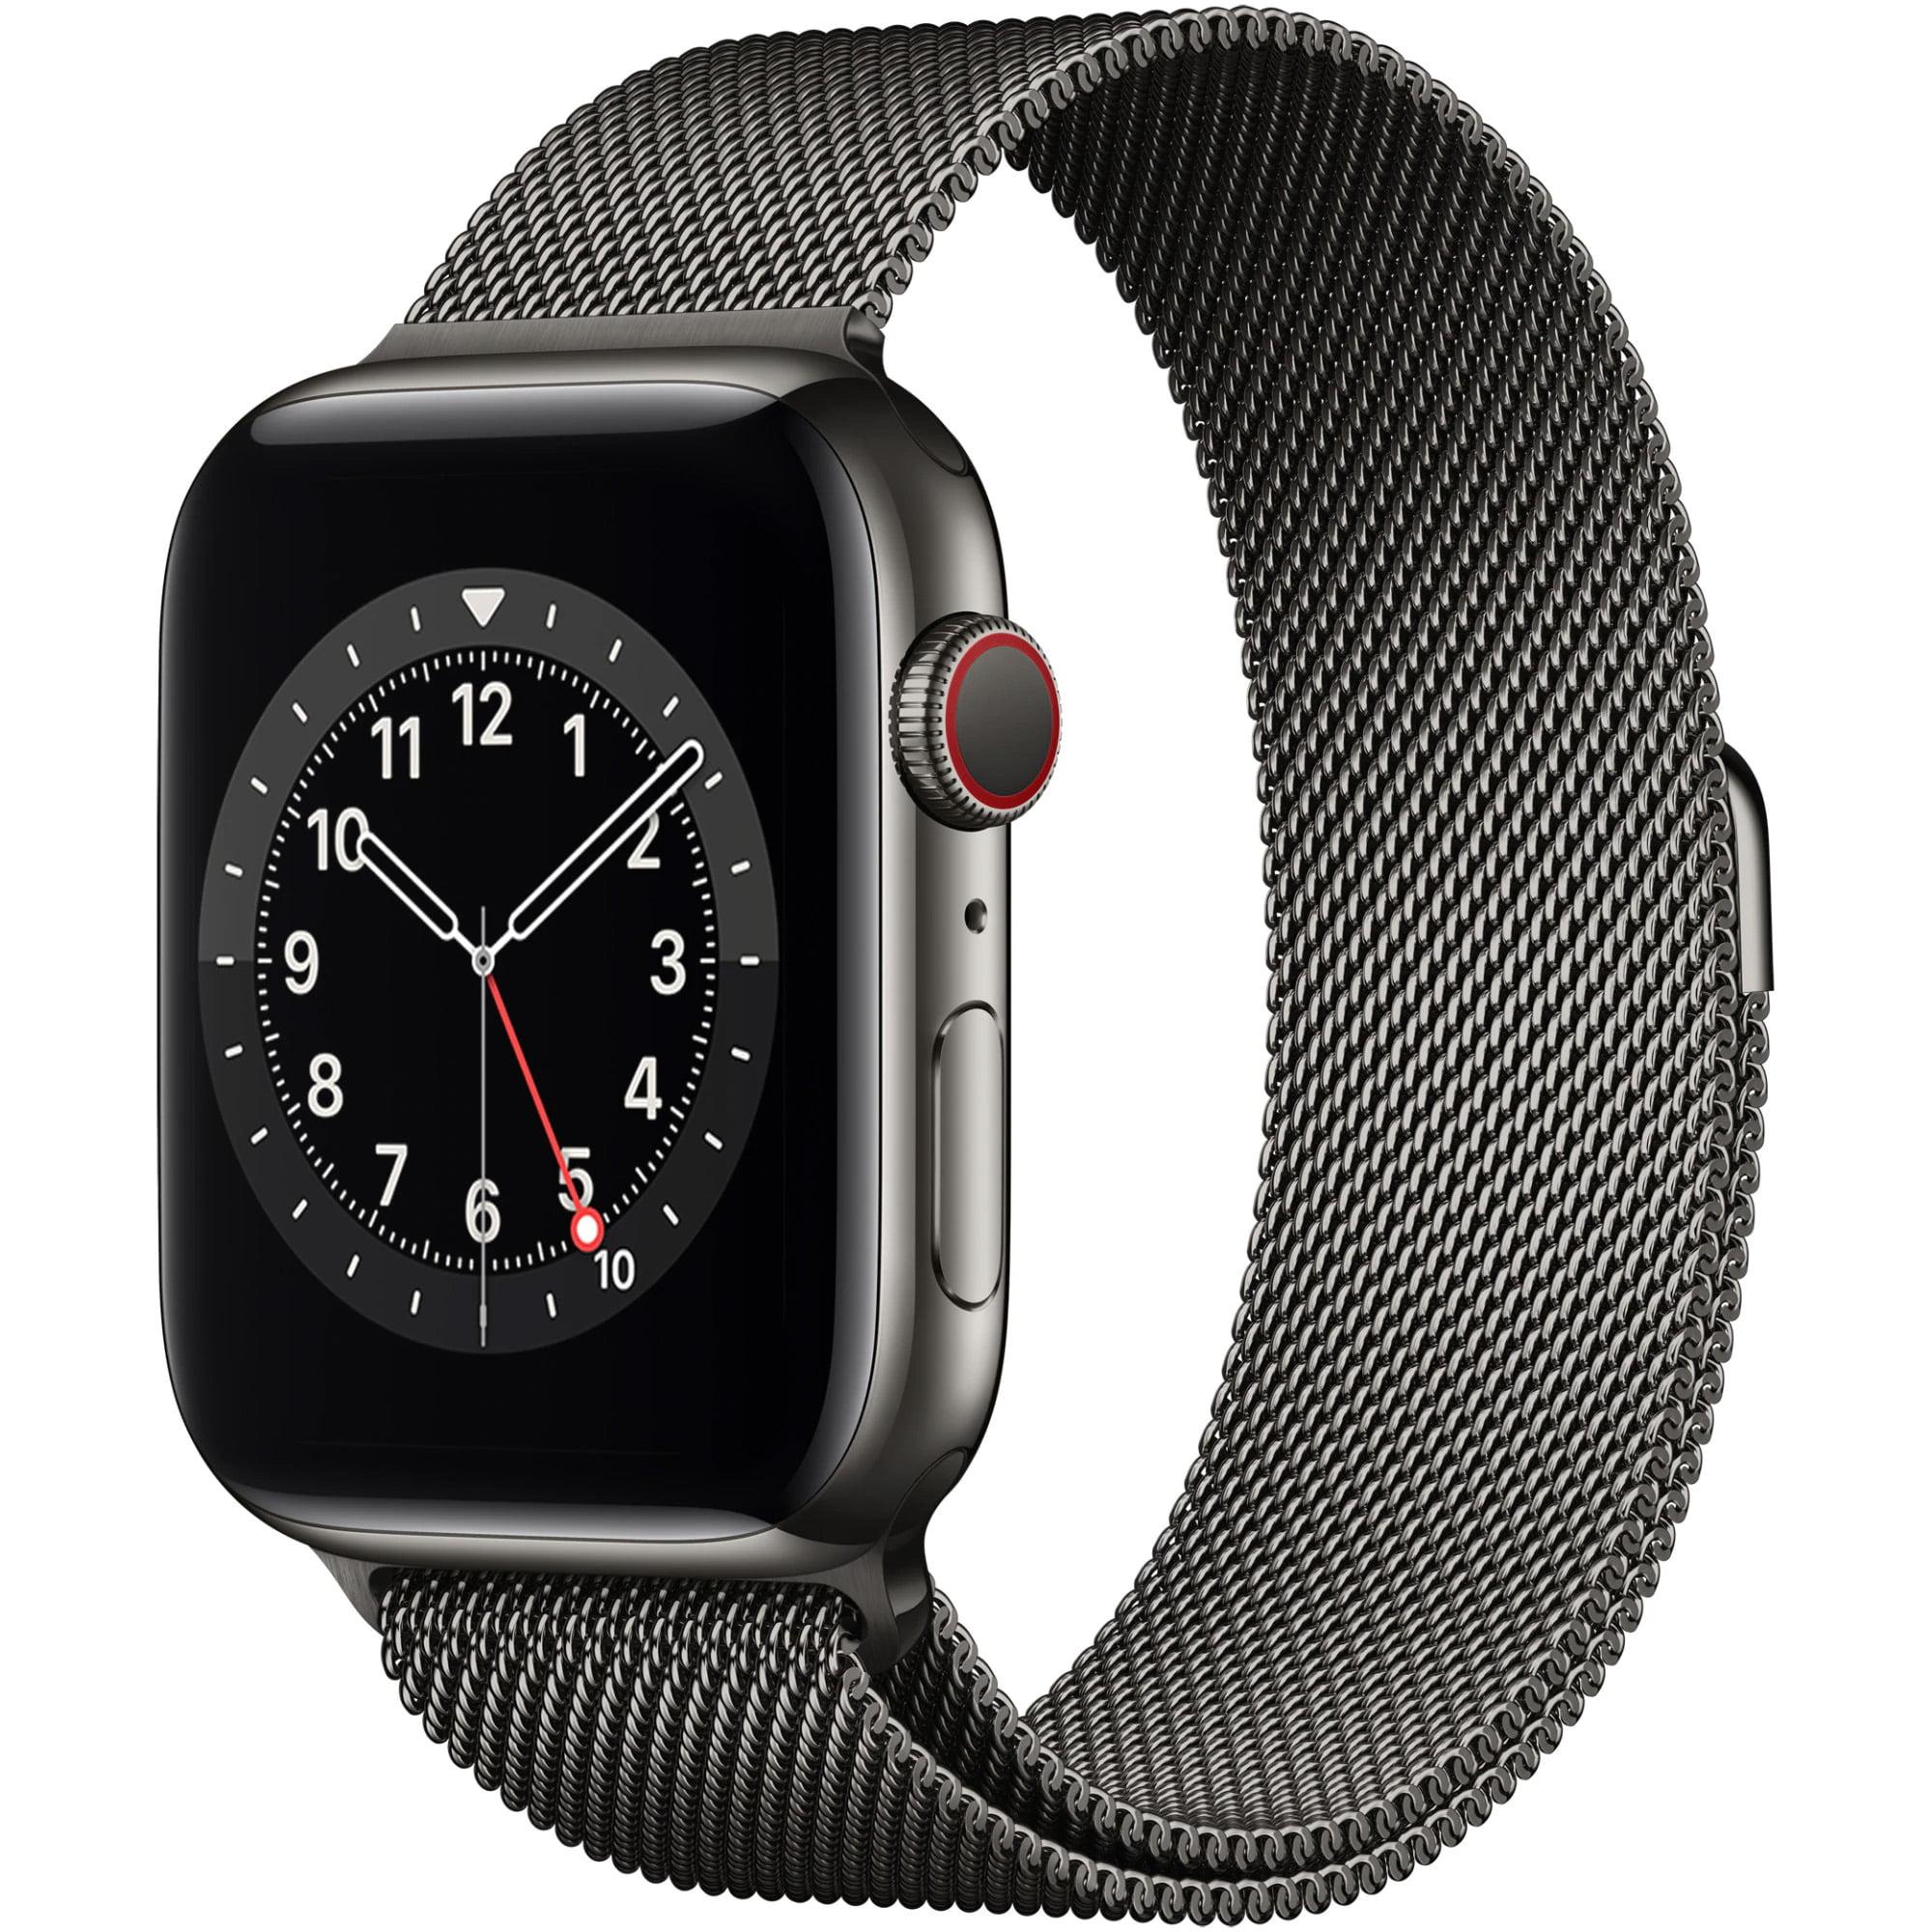 Ceas Smartwatch Apple Watch Series 6, GPS + Cellular, 44mm Graphite Stainless Steel Case, Graphite Milanese Loop